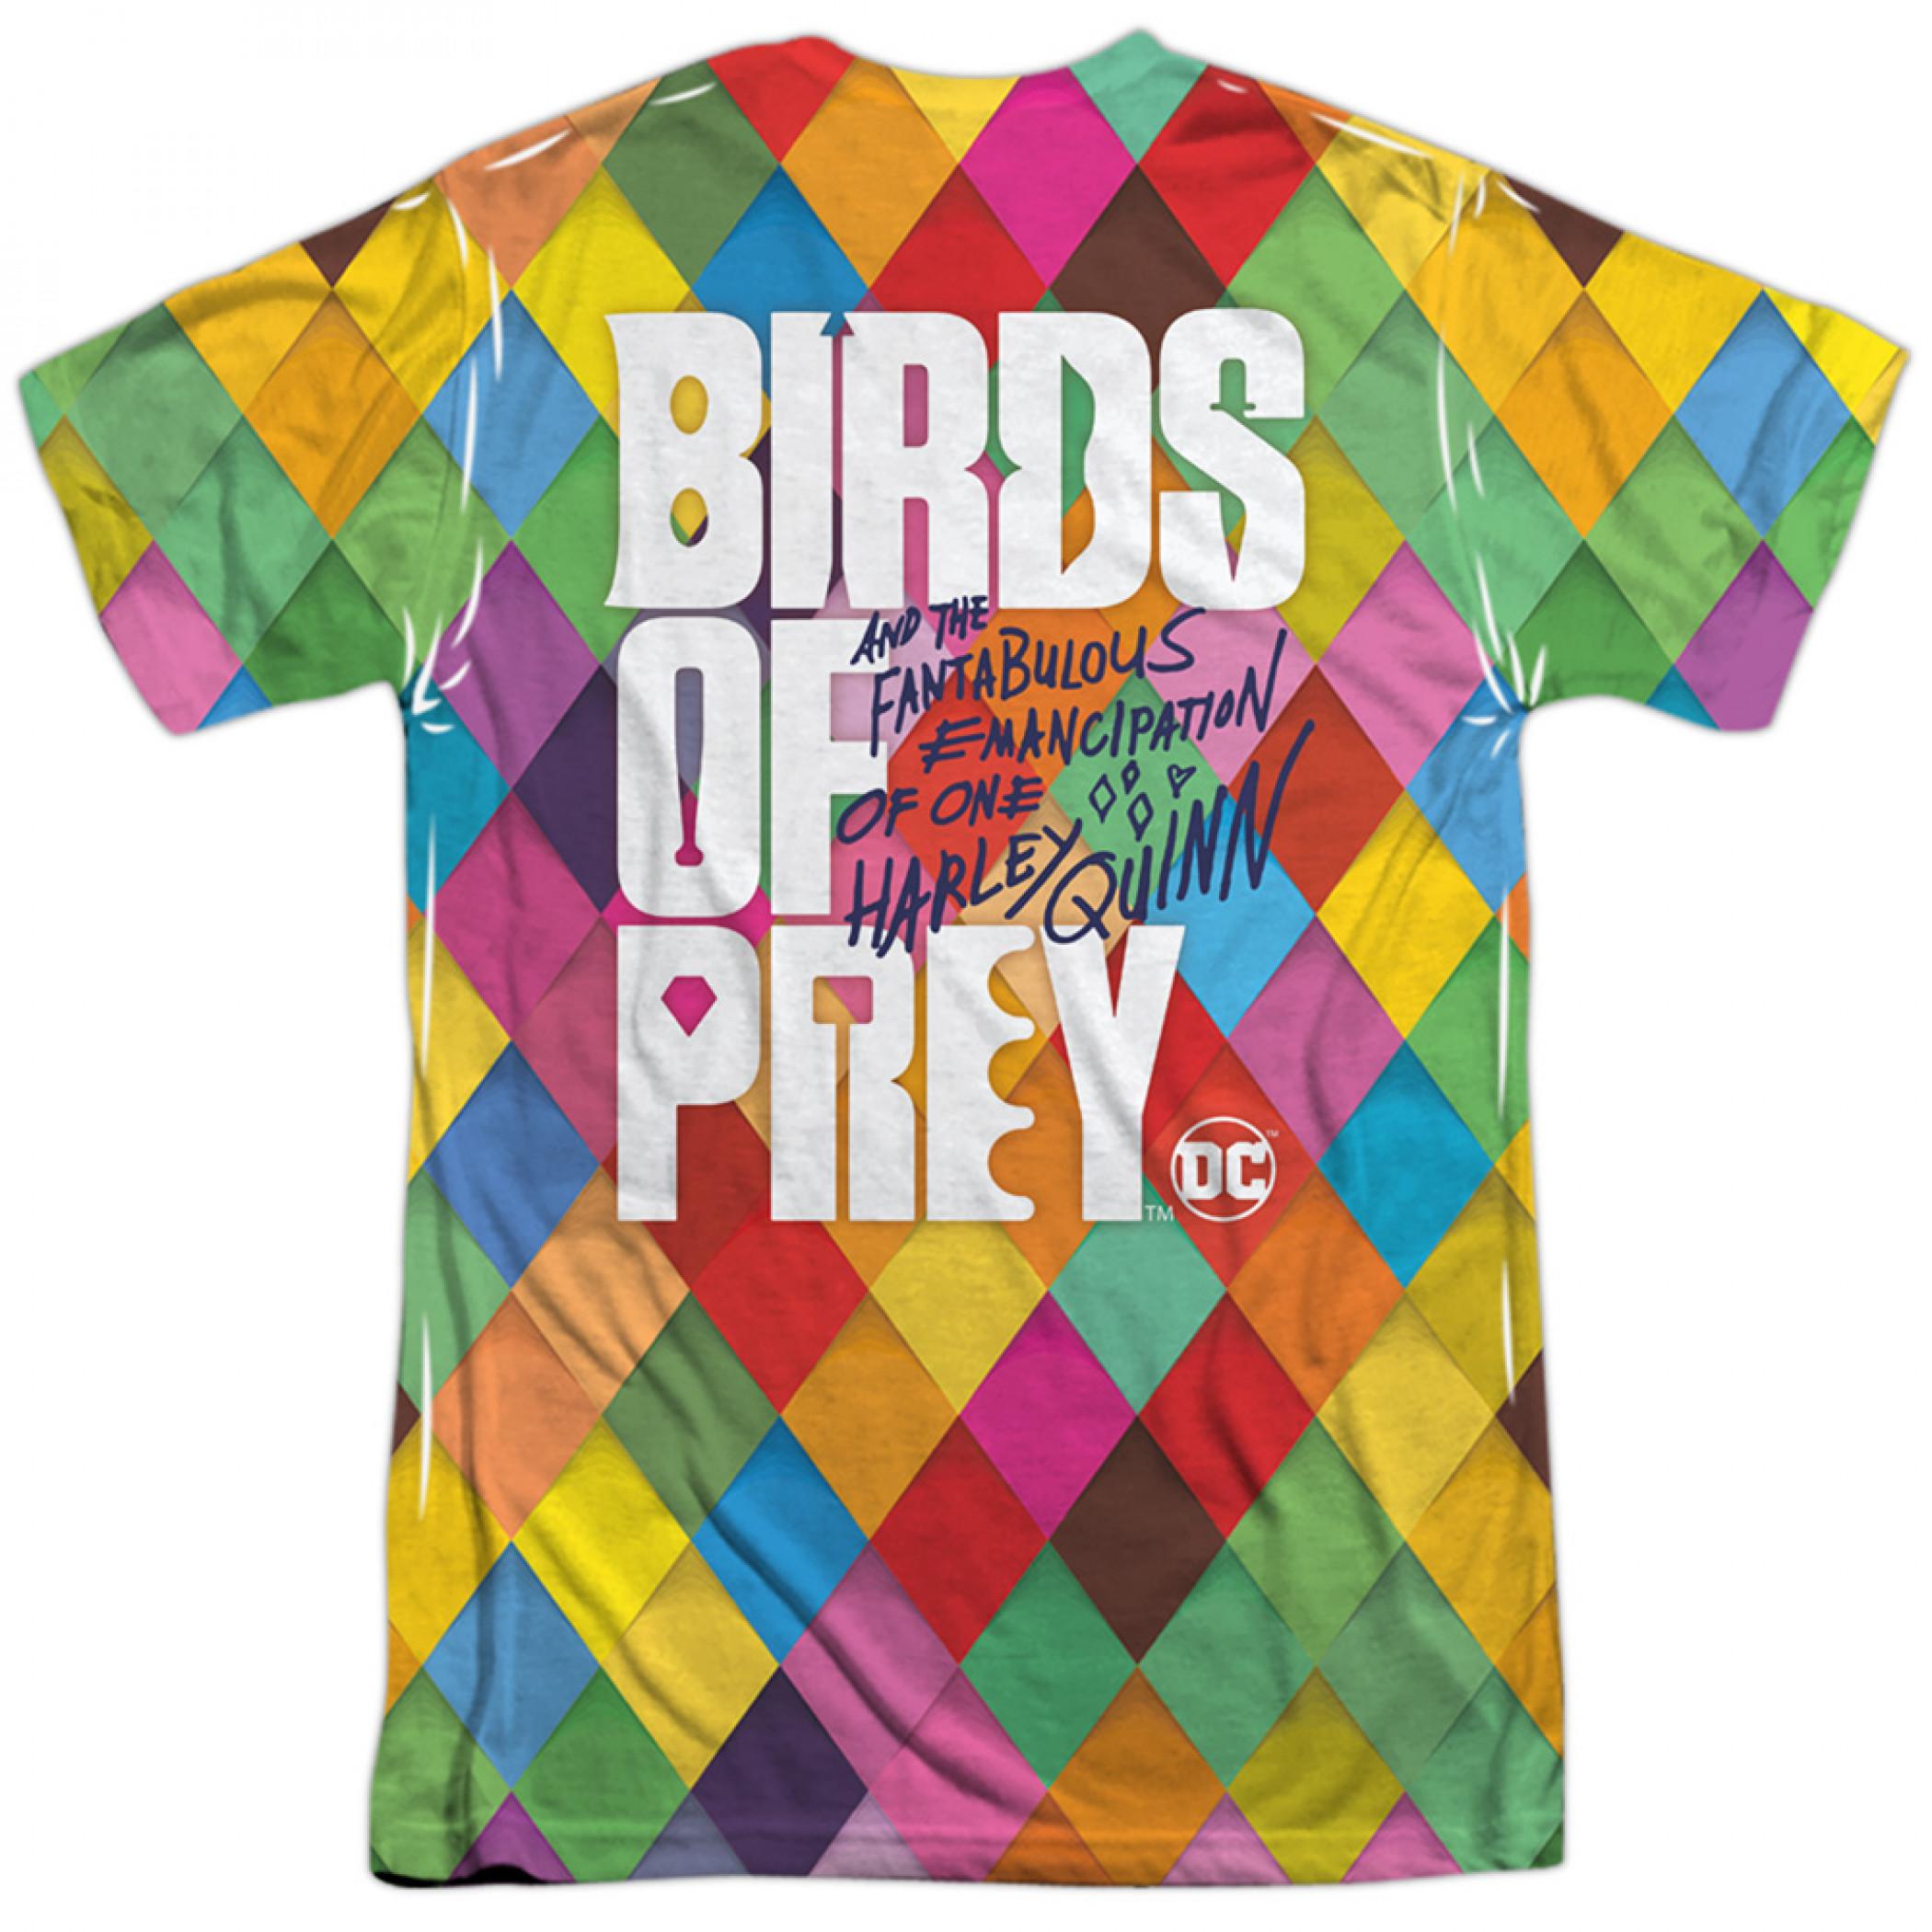 Birds of Prey Harley Quinn Feathers T-Shirt